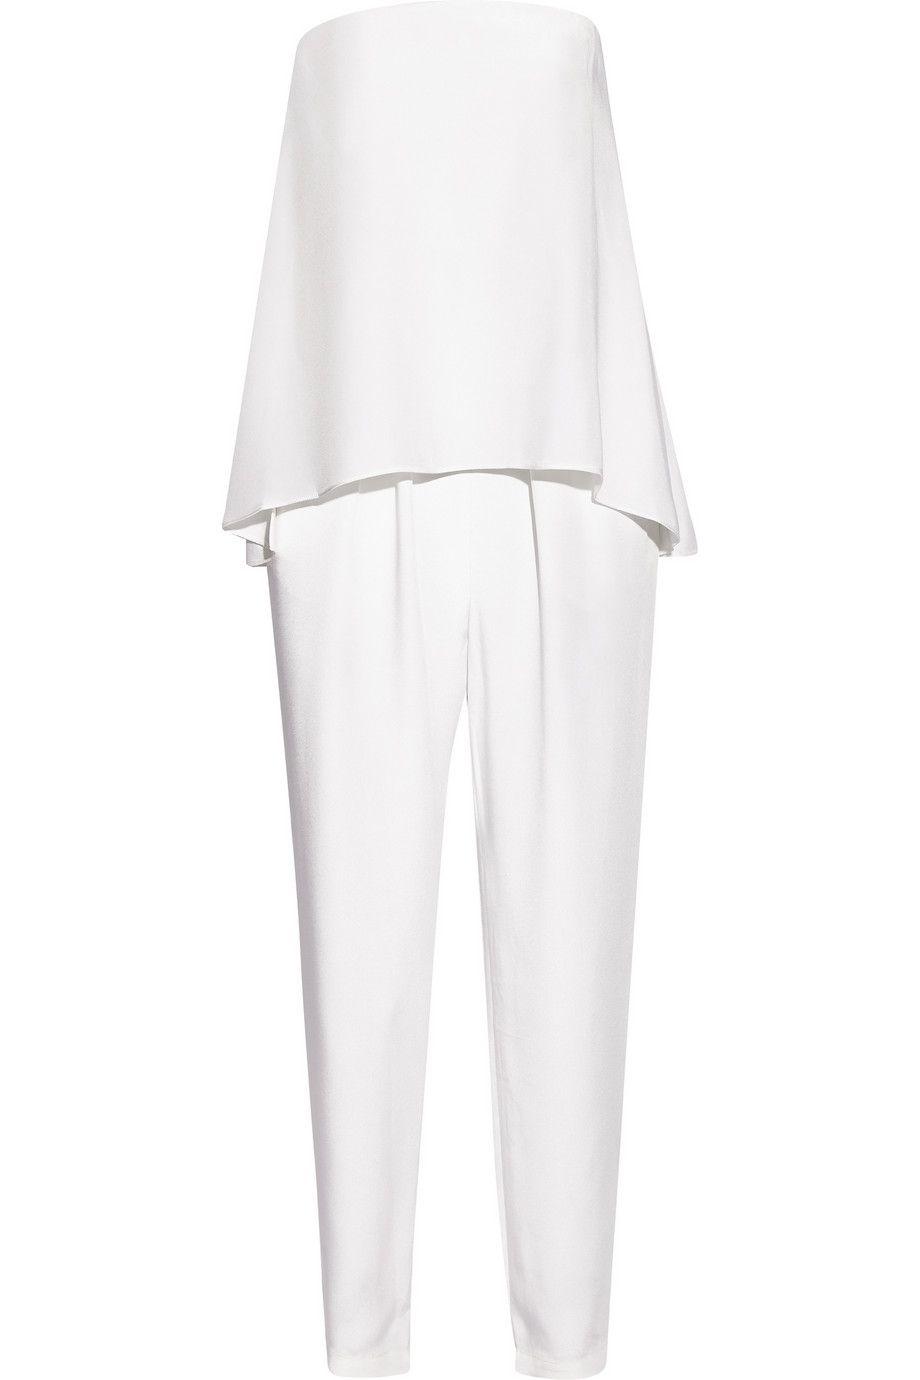 947fe677b12 TIBI Strapless Layered Silk Jumpsuit.  tibi  cloth  jumpsuit ...